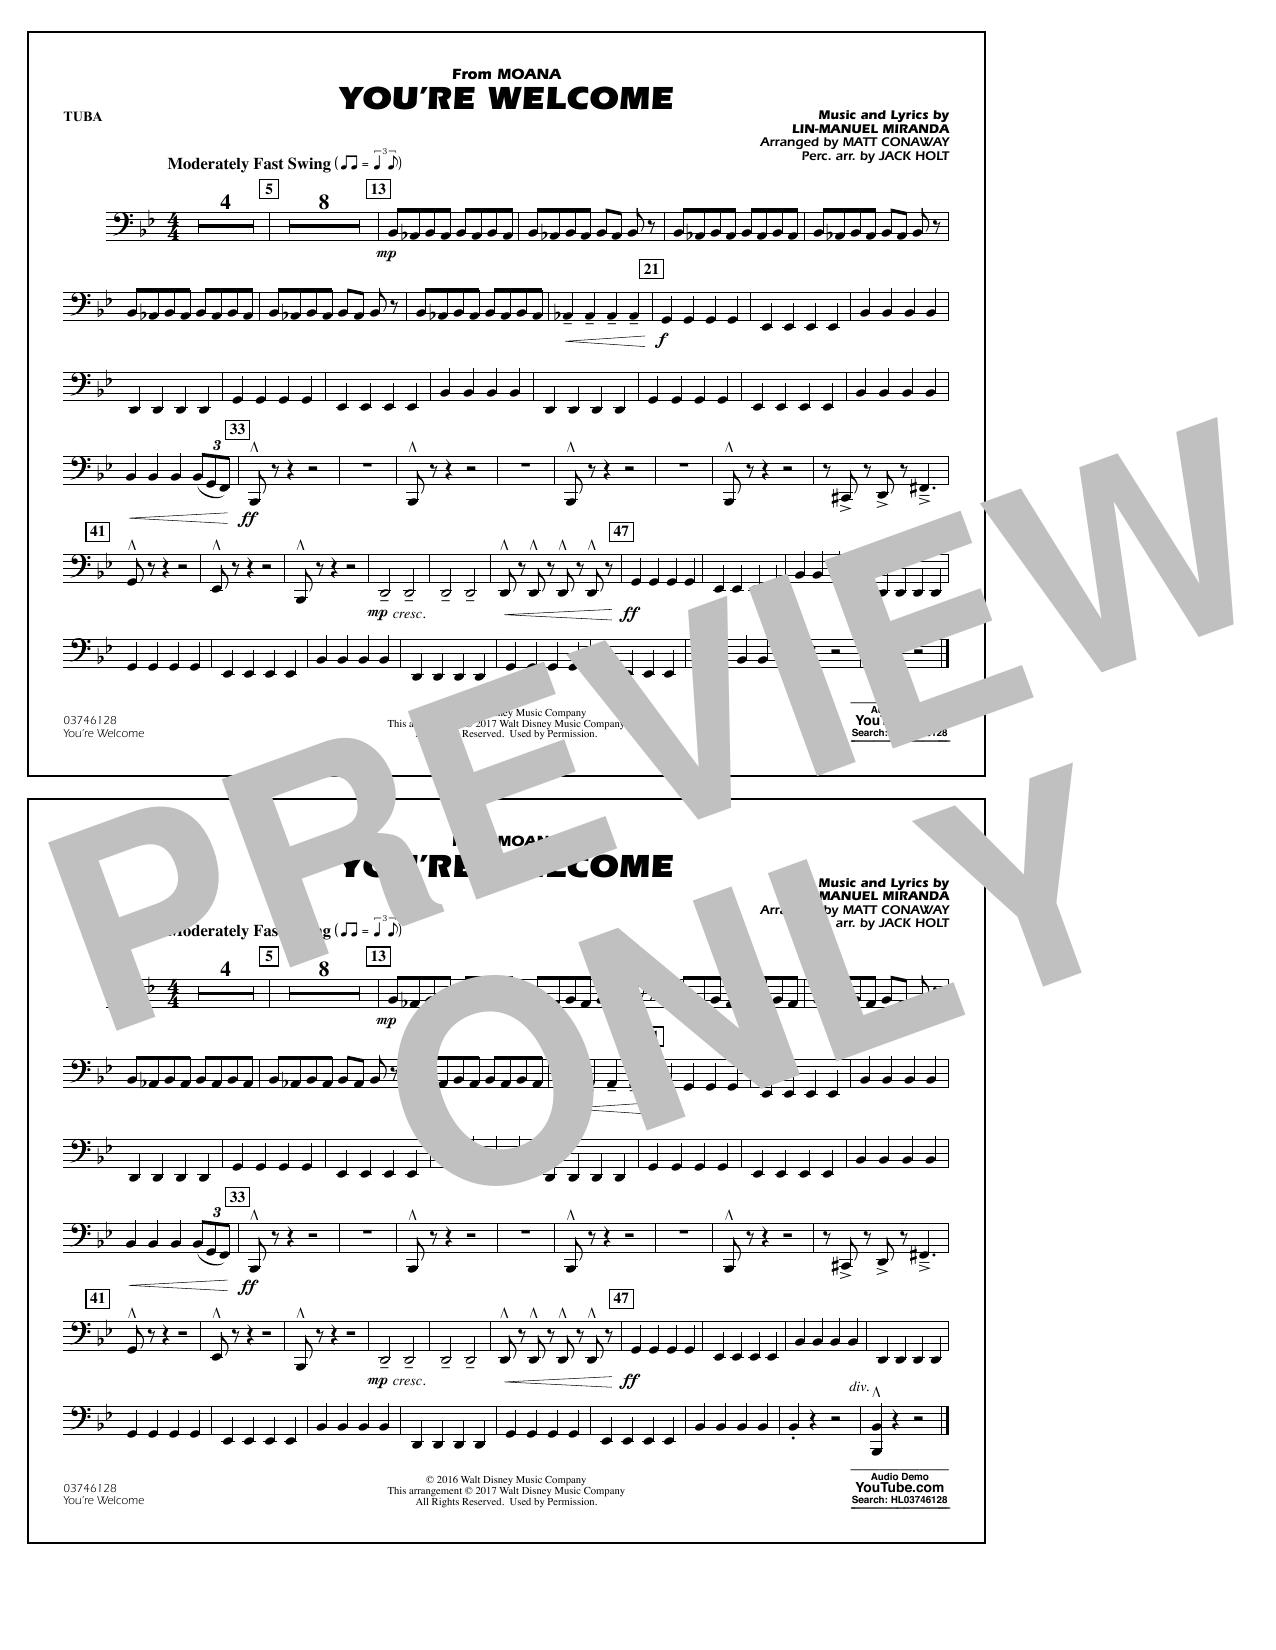 You're Welcome (from Moana) - Tuba Sheet Music